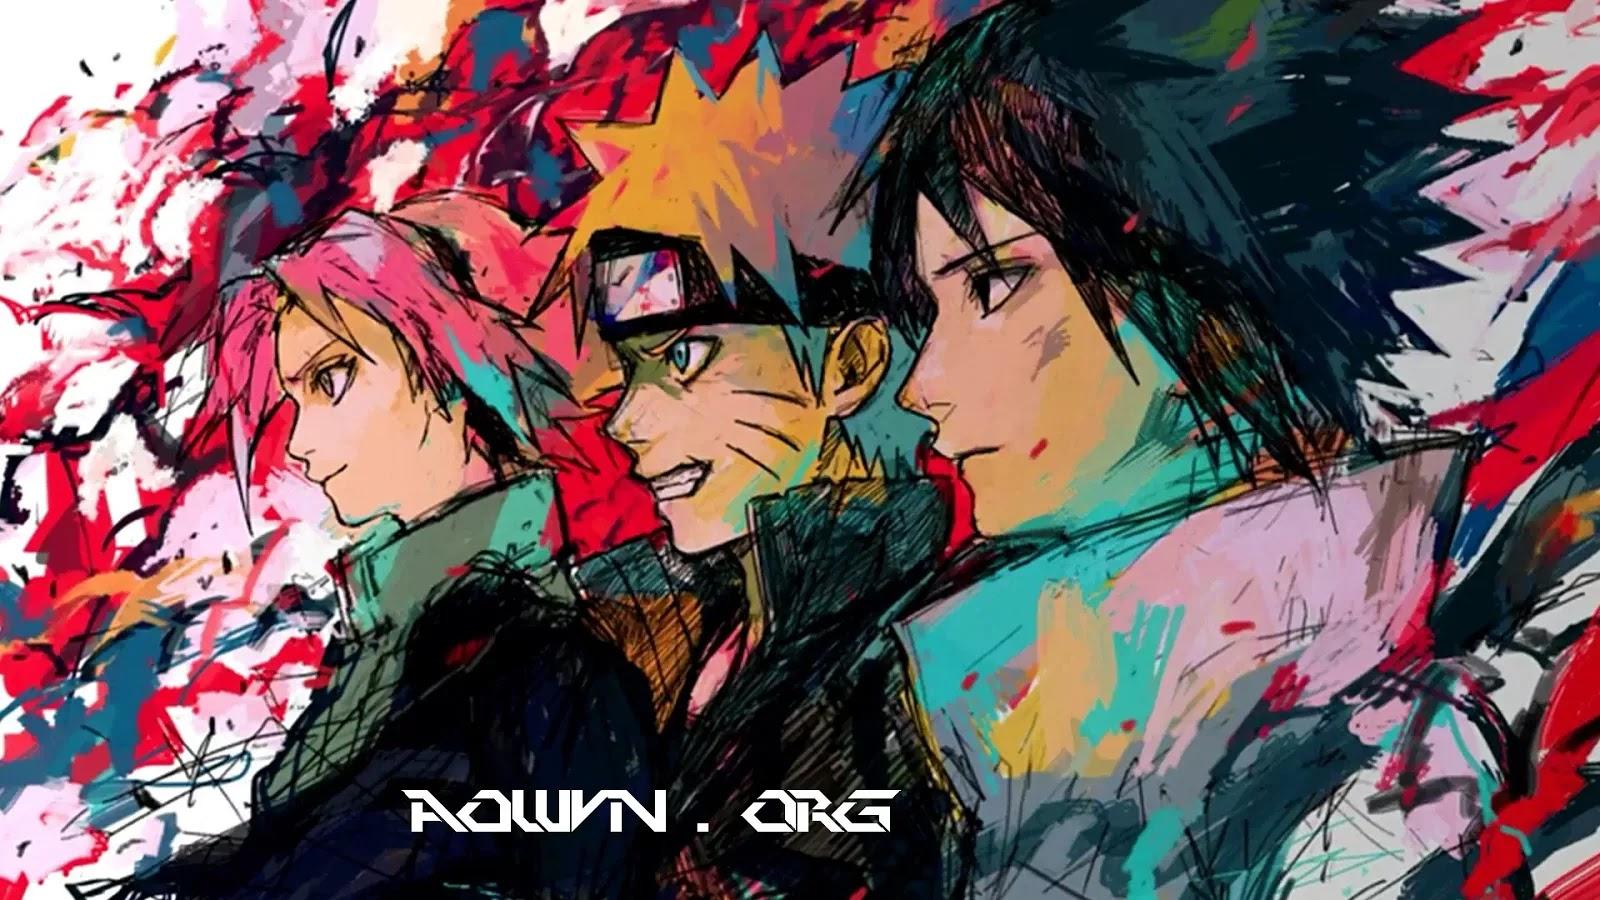 AowVN.org mizn%2B%25281%2529 - [ Anime 3gp Mp4 ] Naruto Shippuuden Season 2  | Vietsub - Huyền thoại